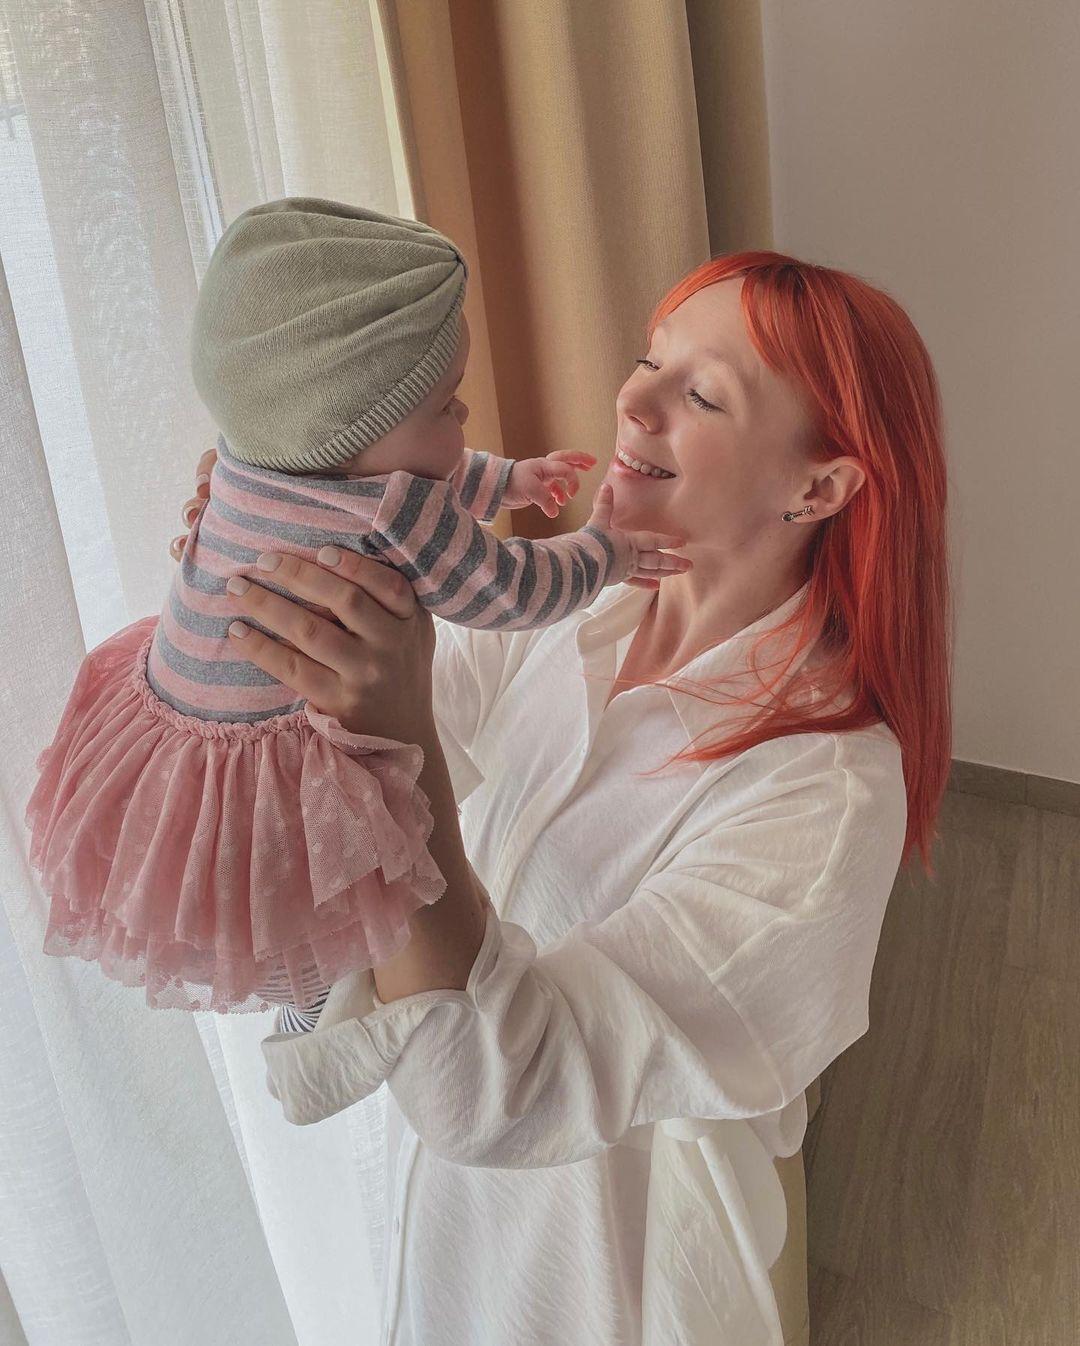 Тарабарова с дочерью Марией